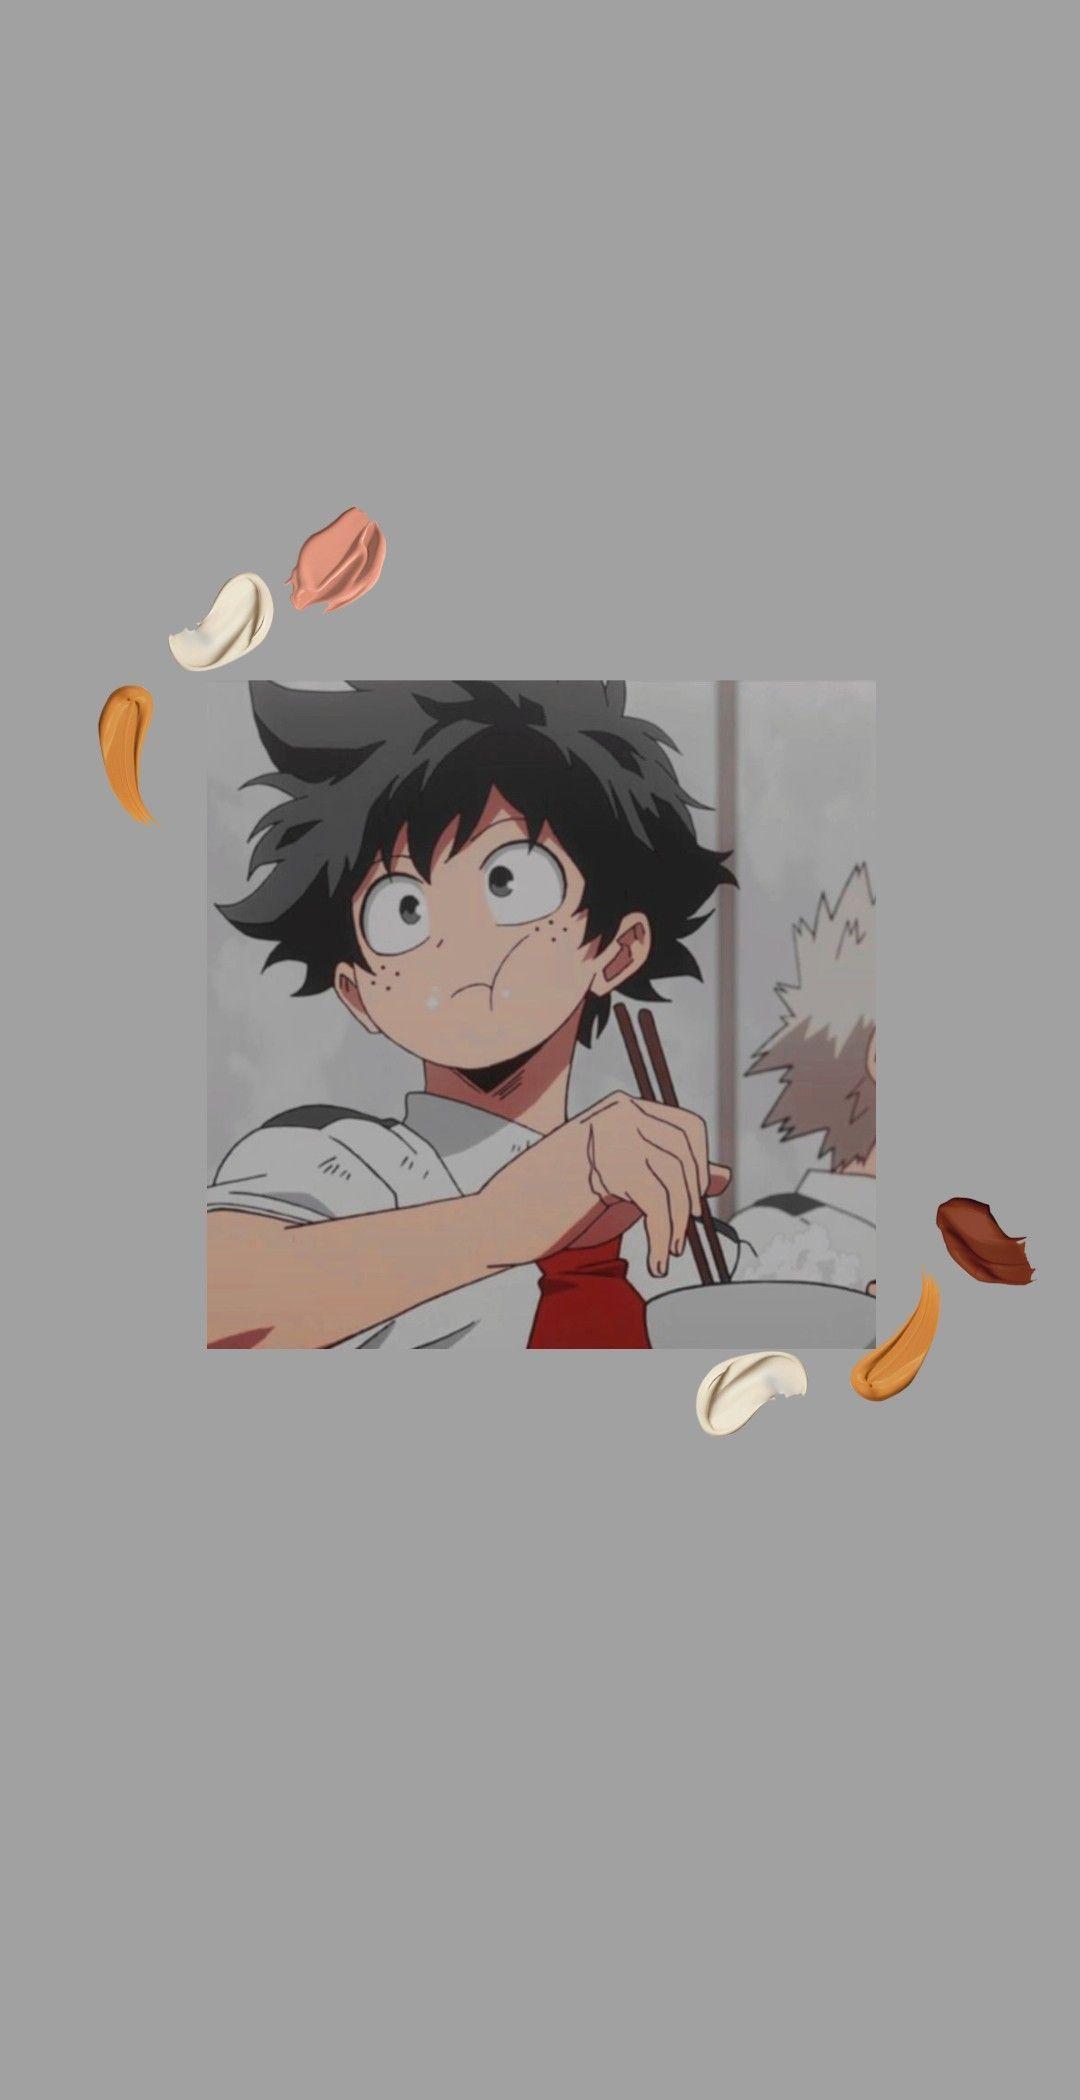 Cute Deku Wallpaper Hero Wallpaper Anime Wallpaper Cute Anime Wallpaper